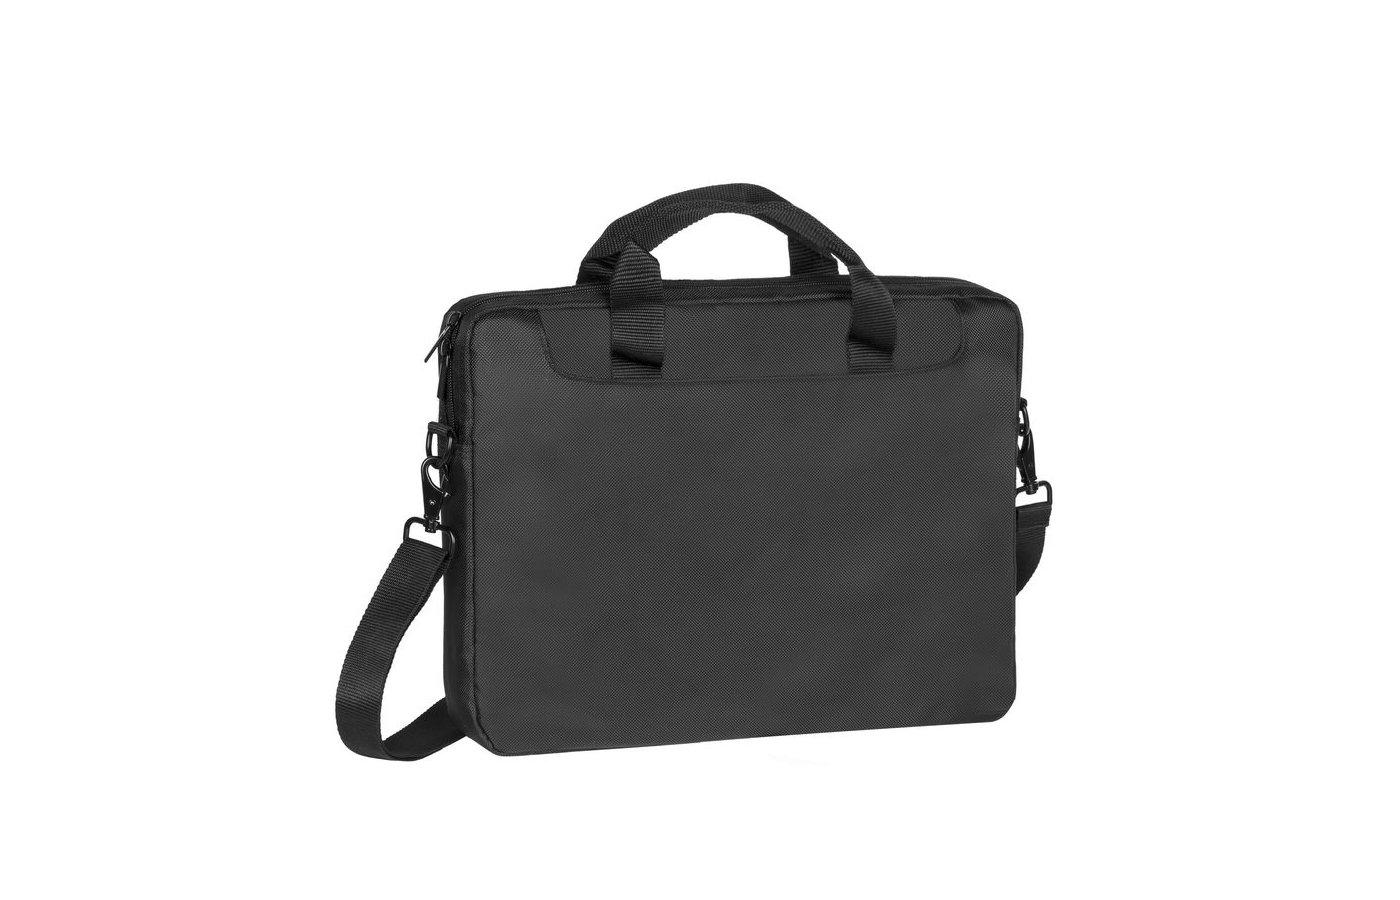 5b6351269183 Кейс для ноутбука RivaCase 8033 black для ноутбука 15.6 - купить ...